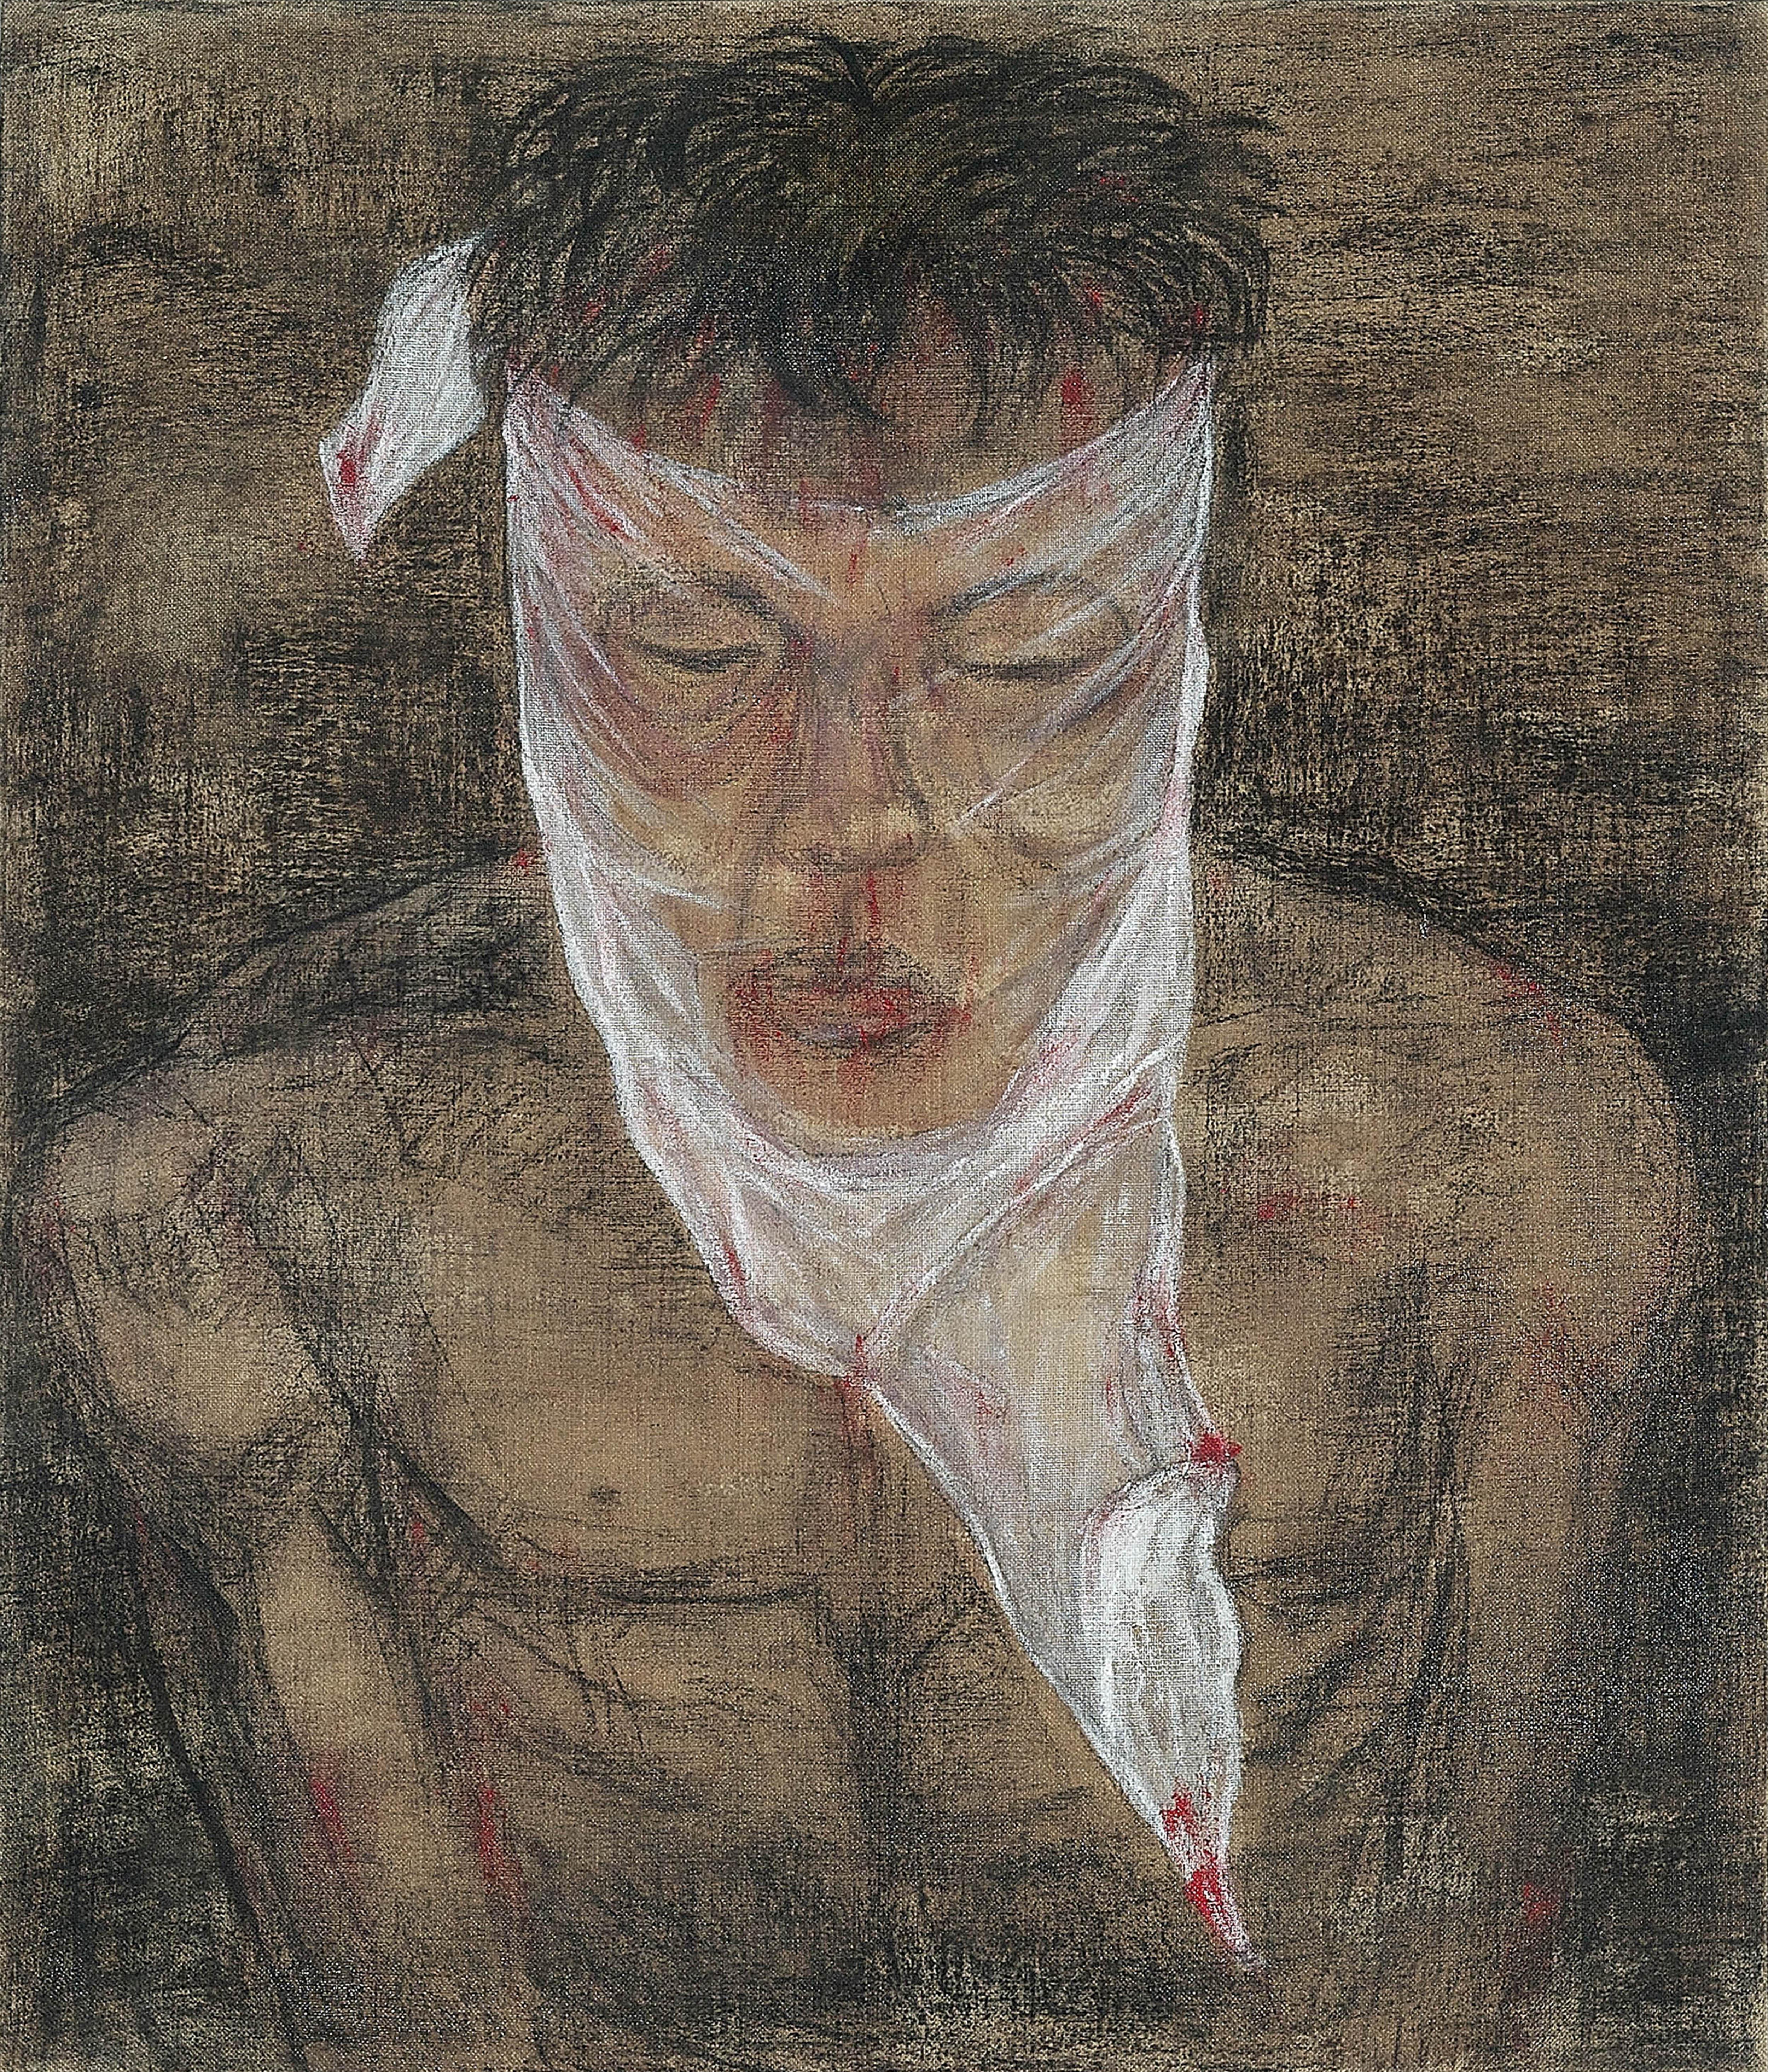 Ciduk, Siksa, Bunuh, Buang IV (2018) Acrylic and charcoal on canvas; 170cm x 145cm